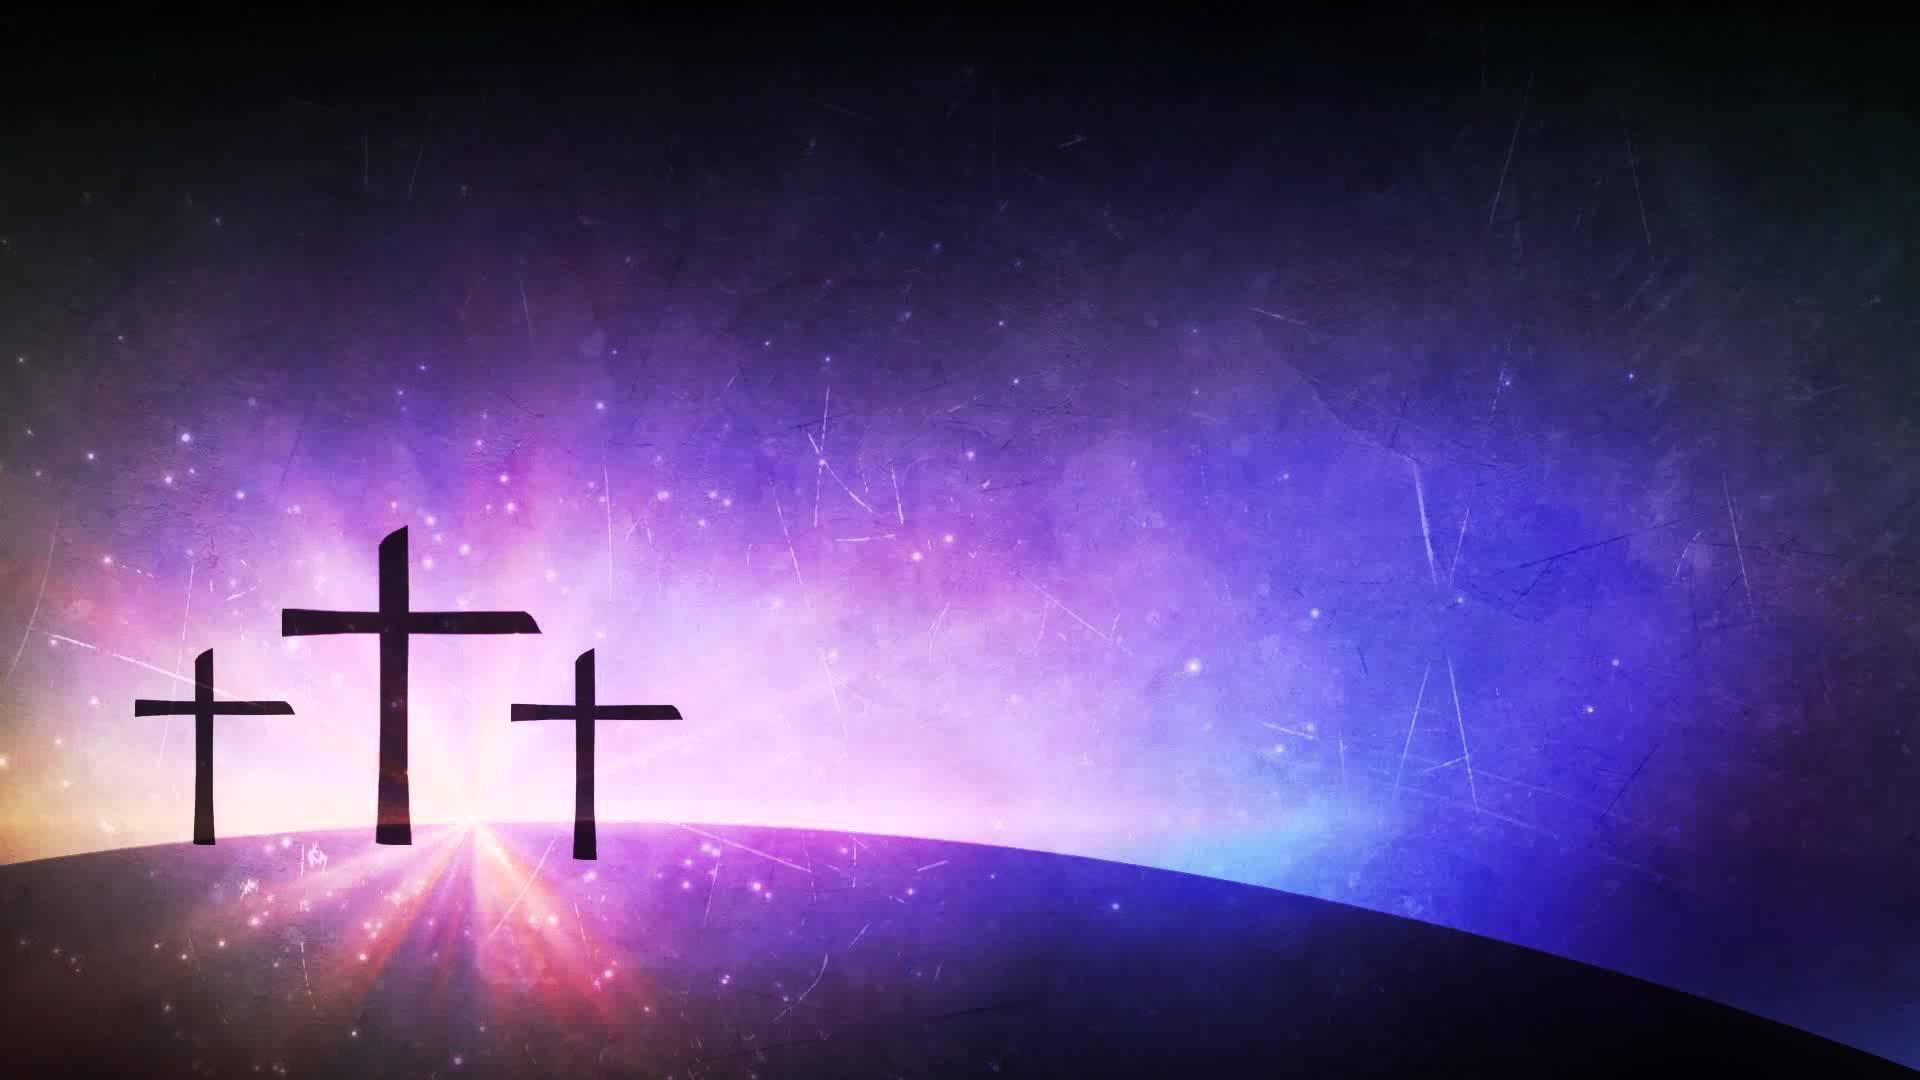 Purple Church Wallpapers Top Free Purple Church Backgrounds Wallpaperaccess